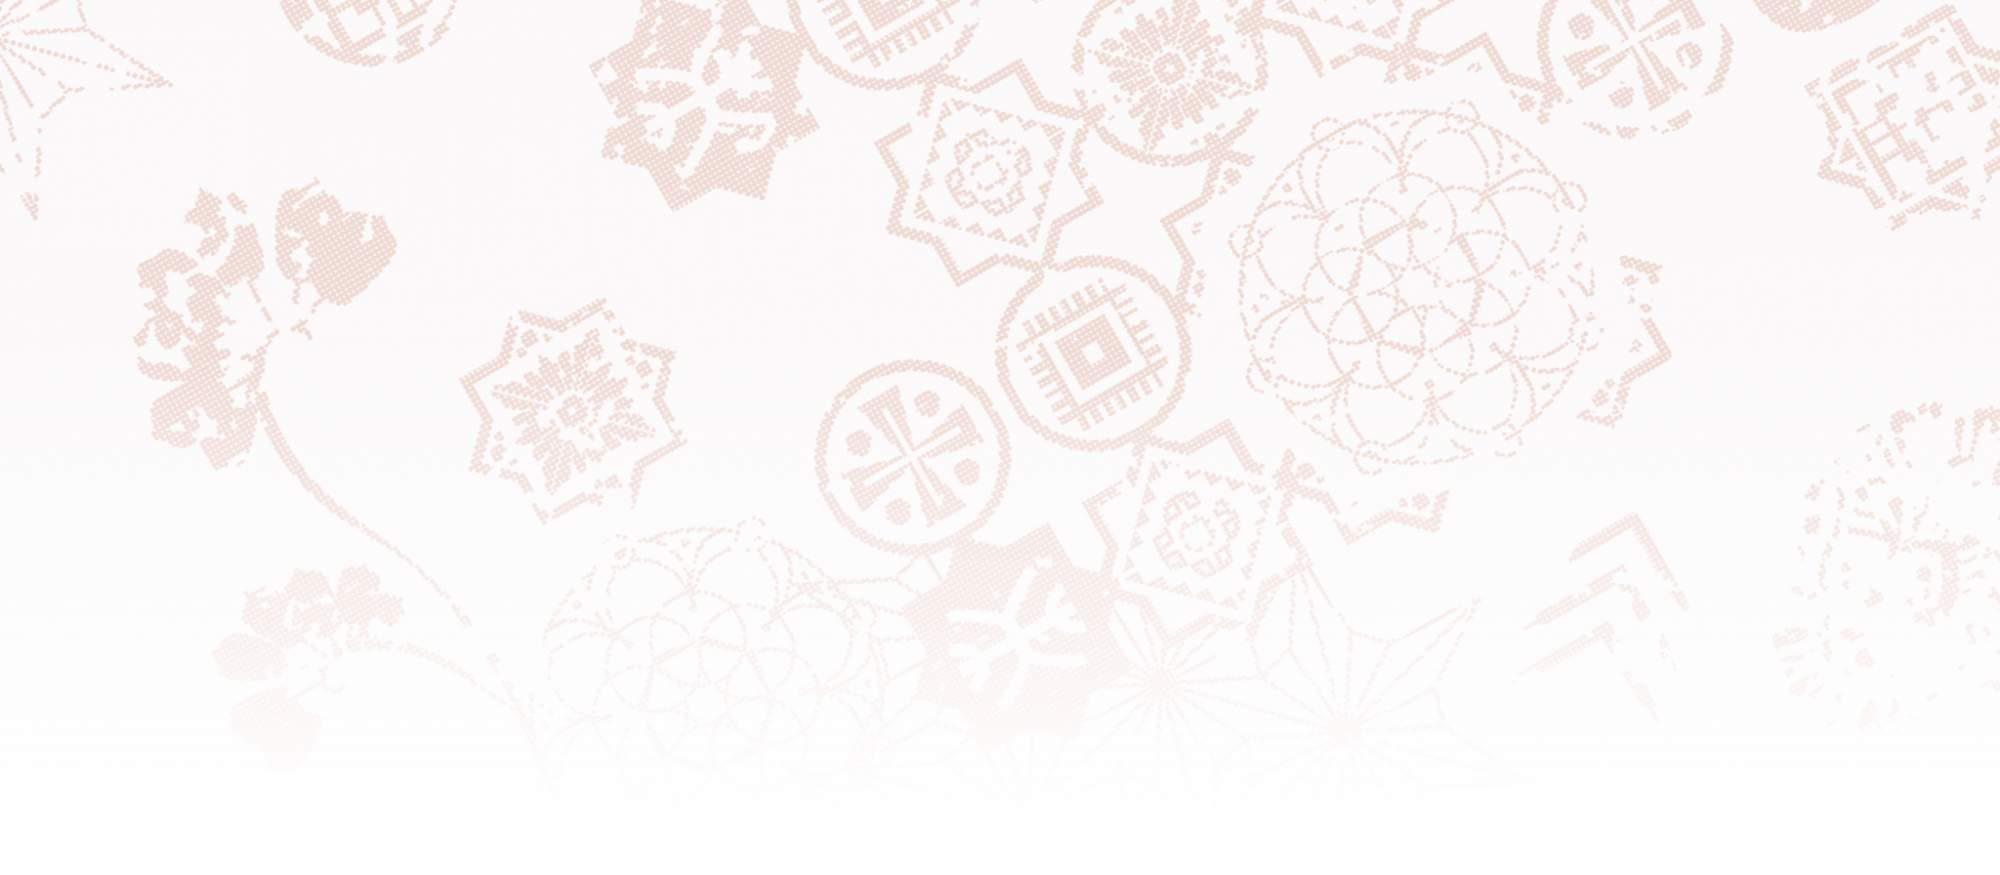 Header-Background-Red Noel